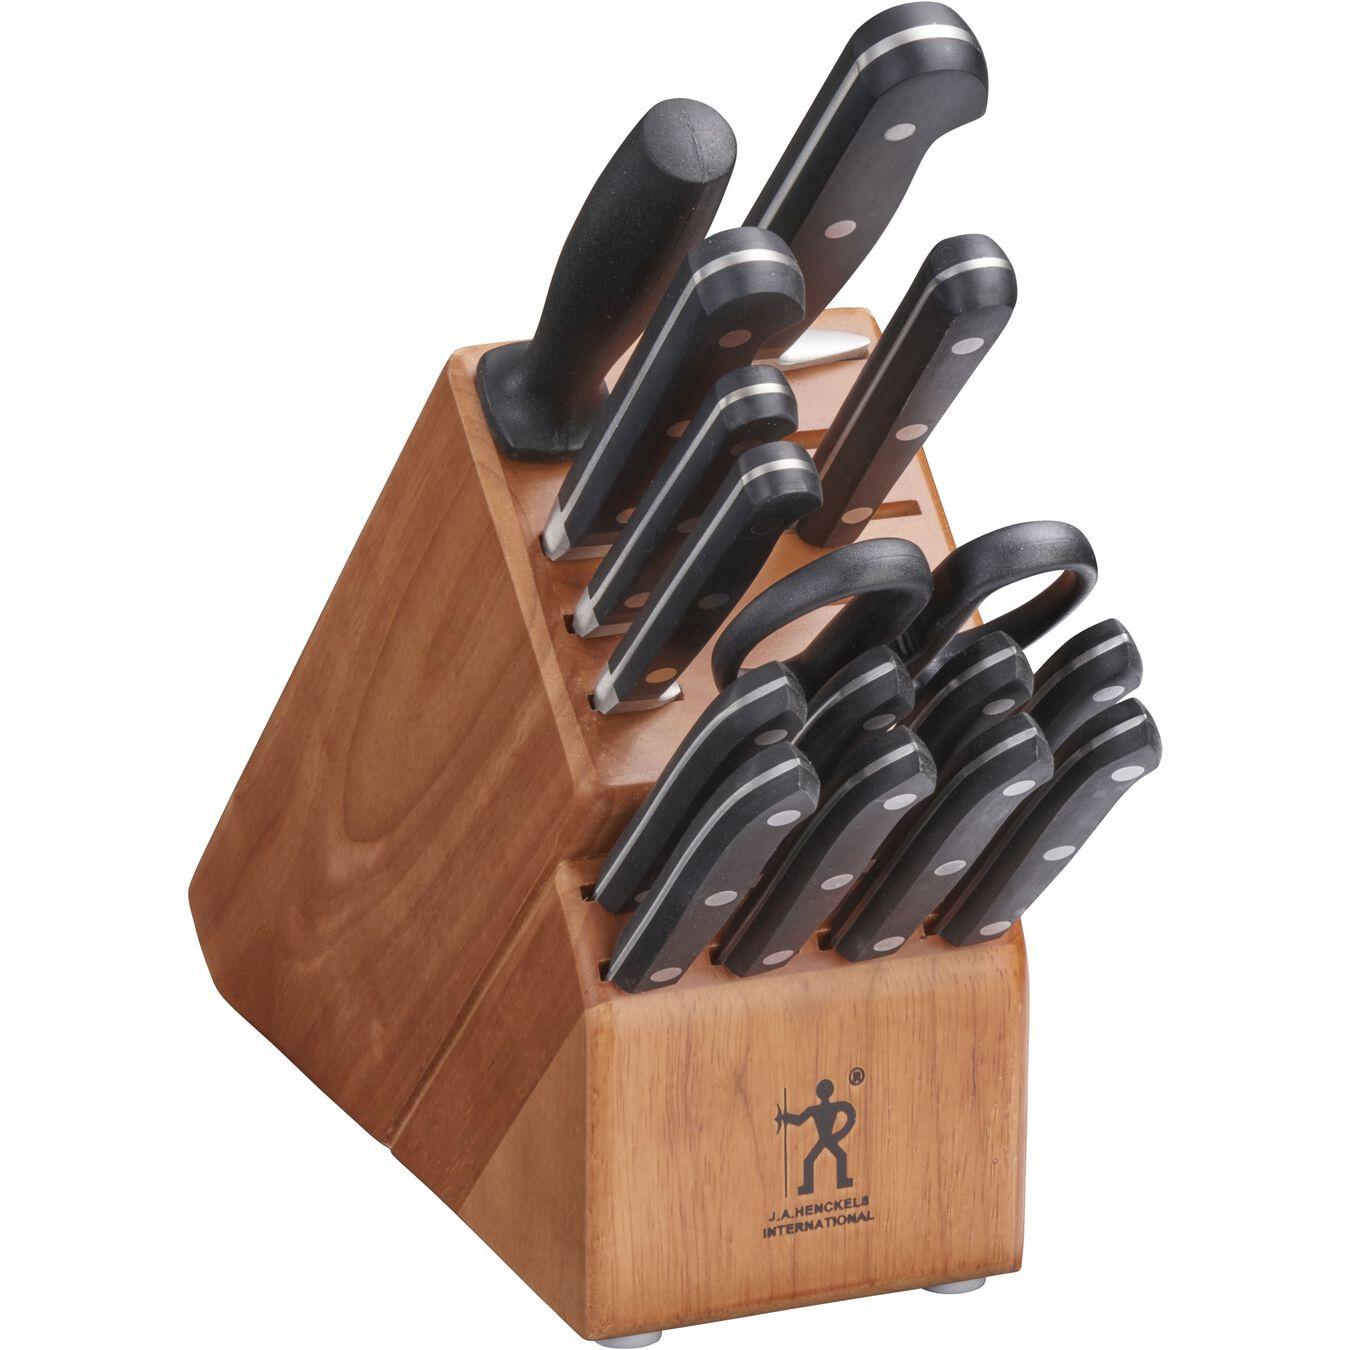 16-pc Knife Block Set,,large 1